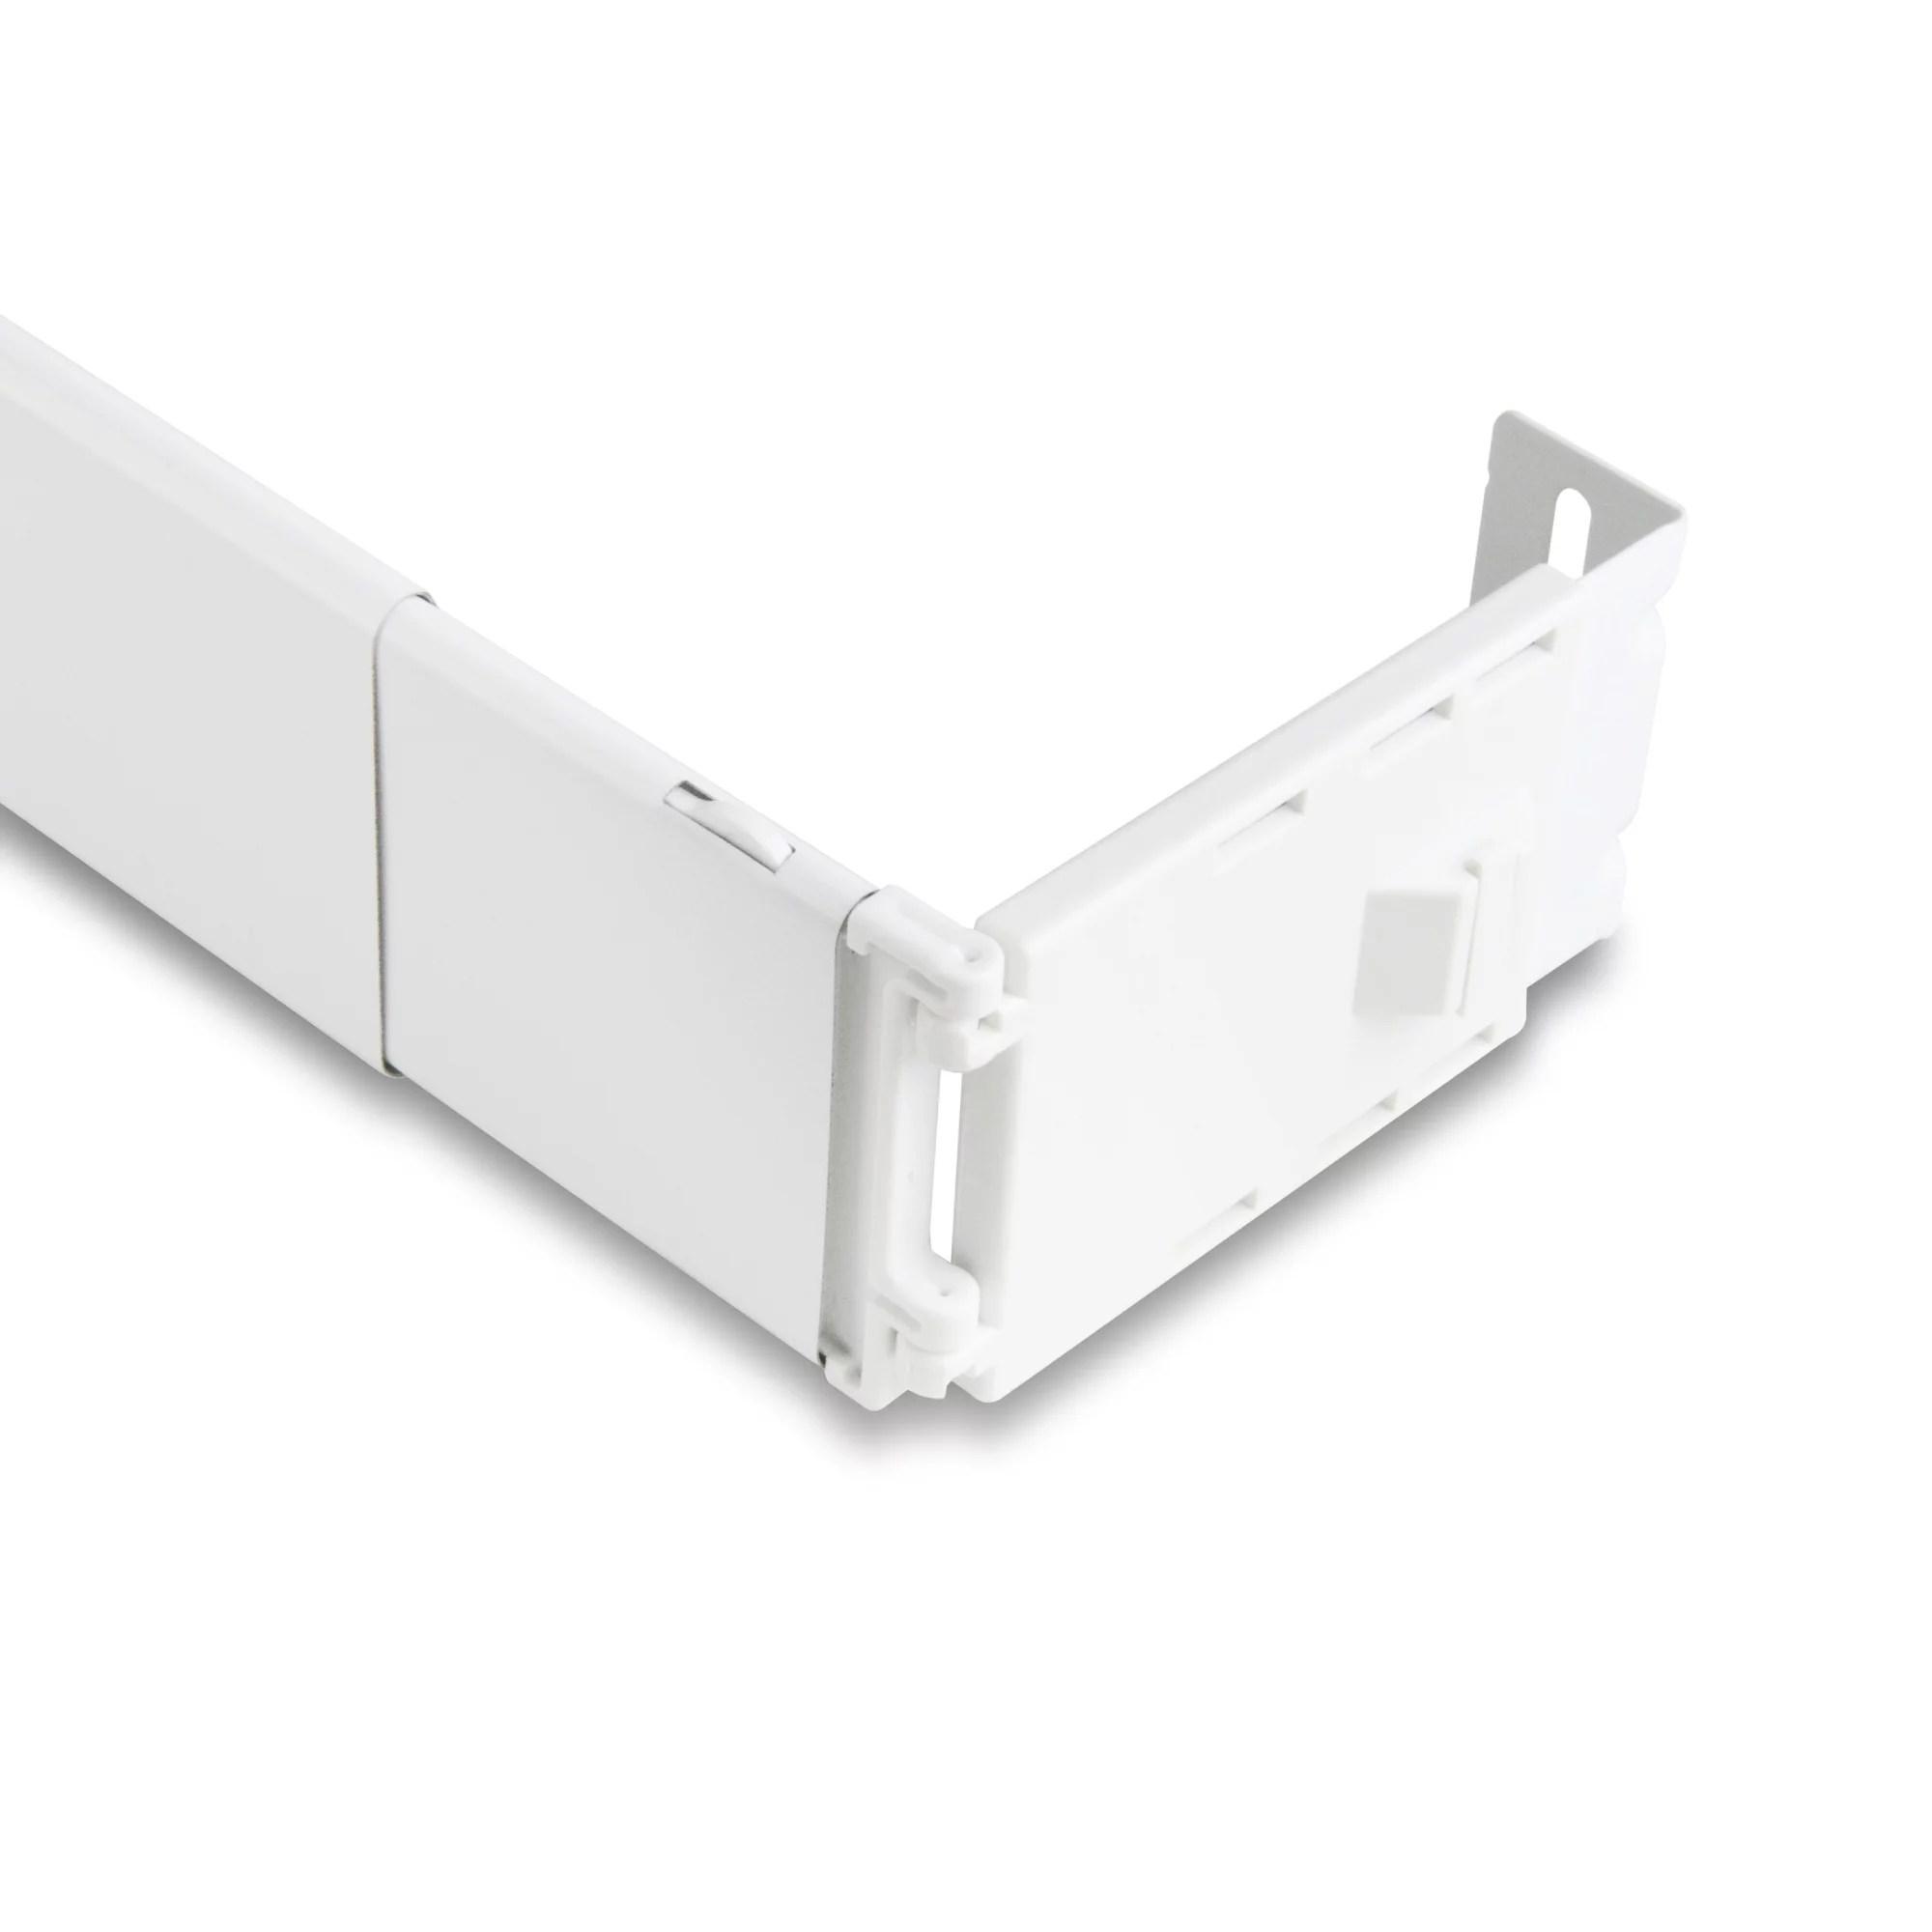 wide pocket curtain rod 84 156 inch white walmart com